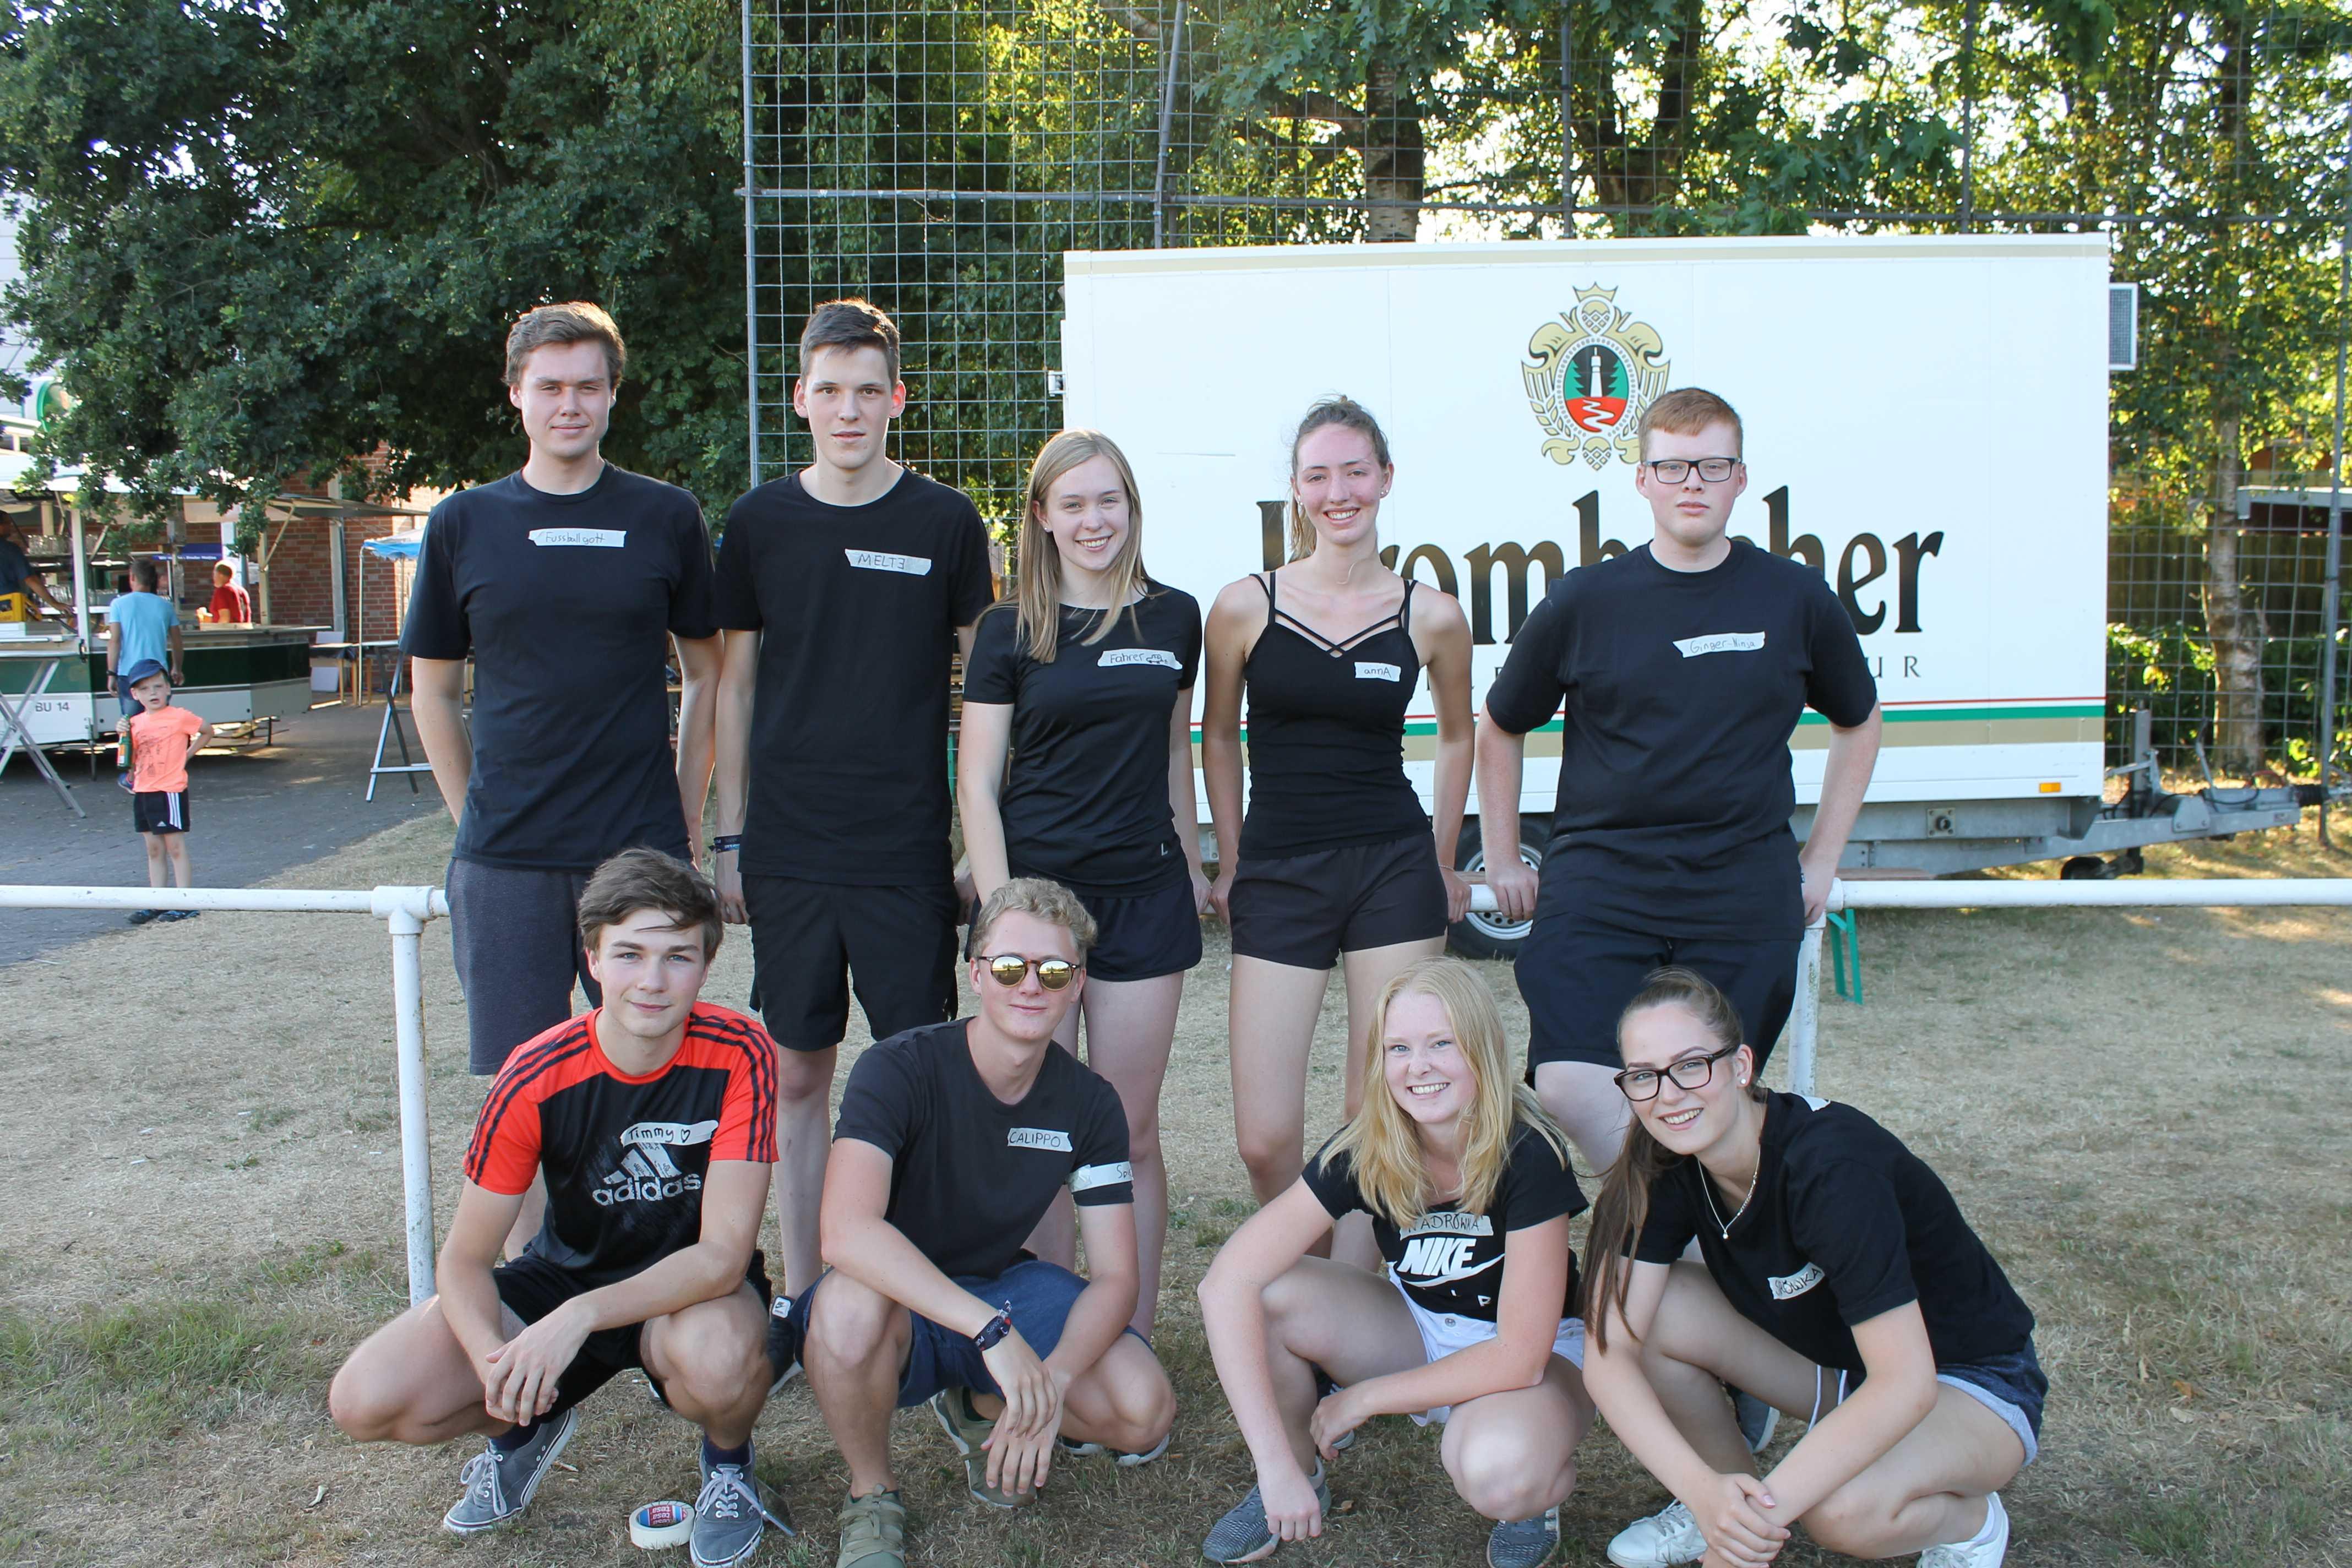 2018-07-27 Sportwoche - Flunkyball Turnier (6)